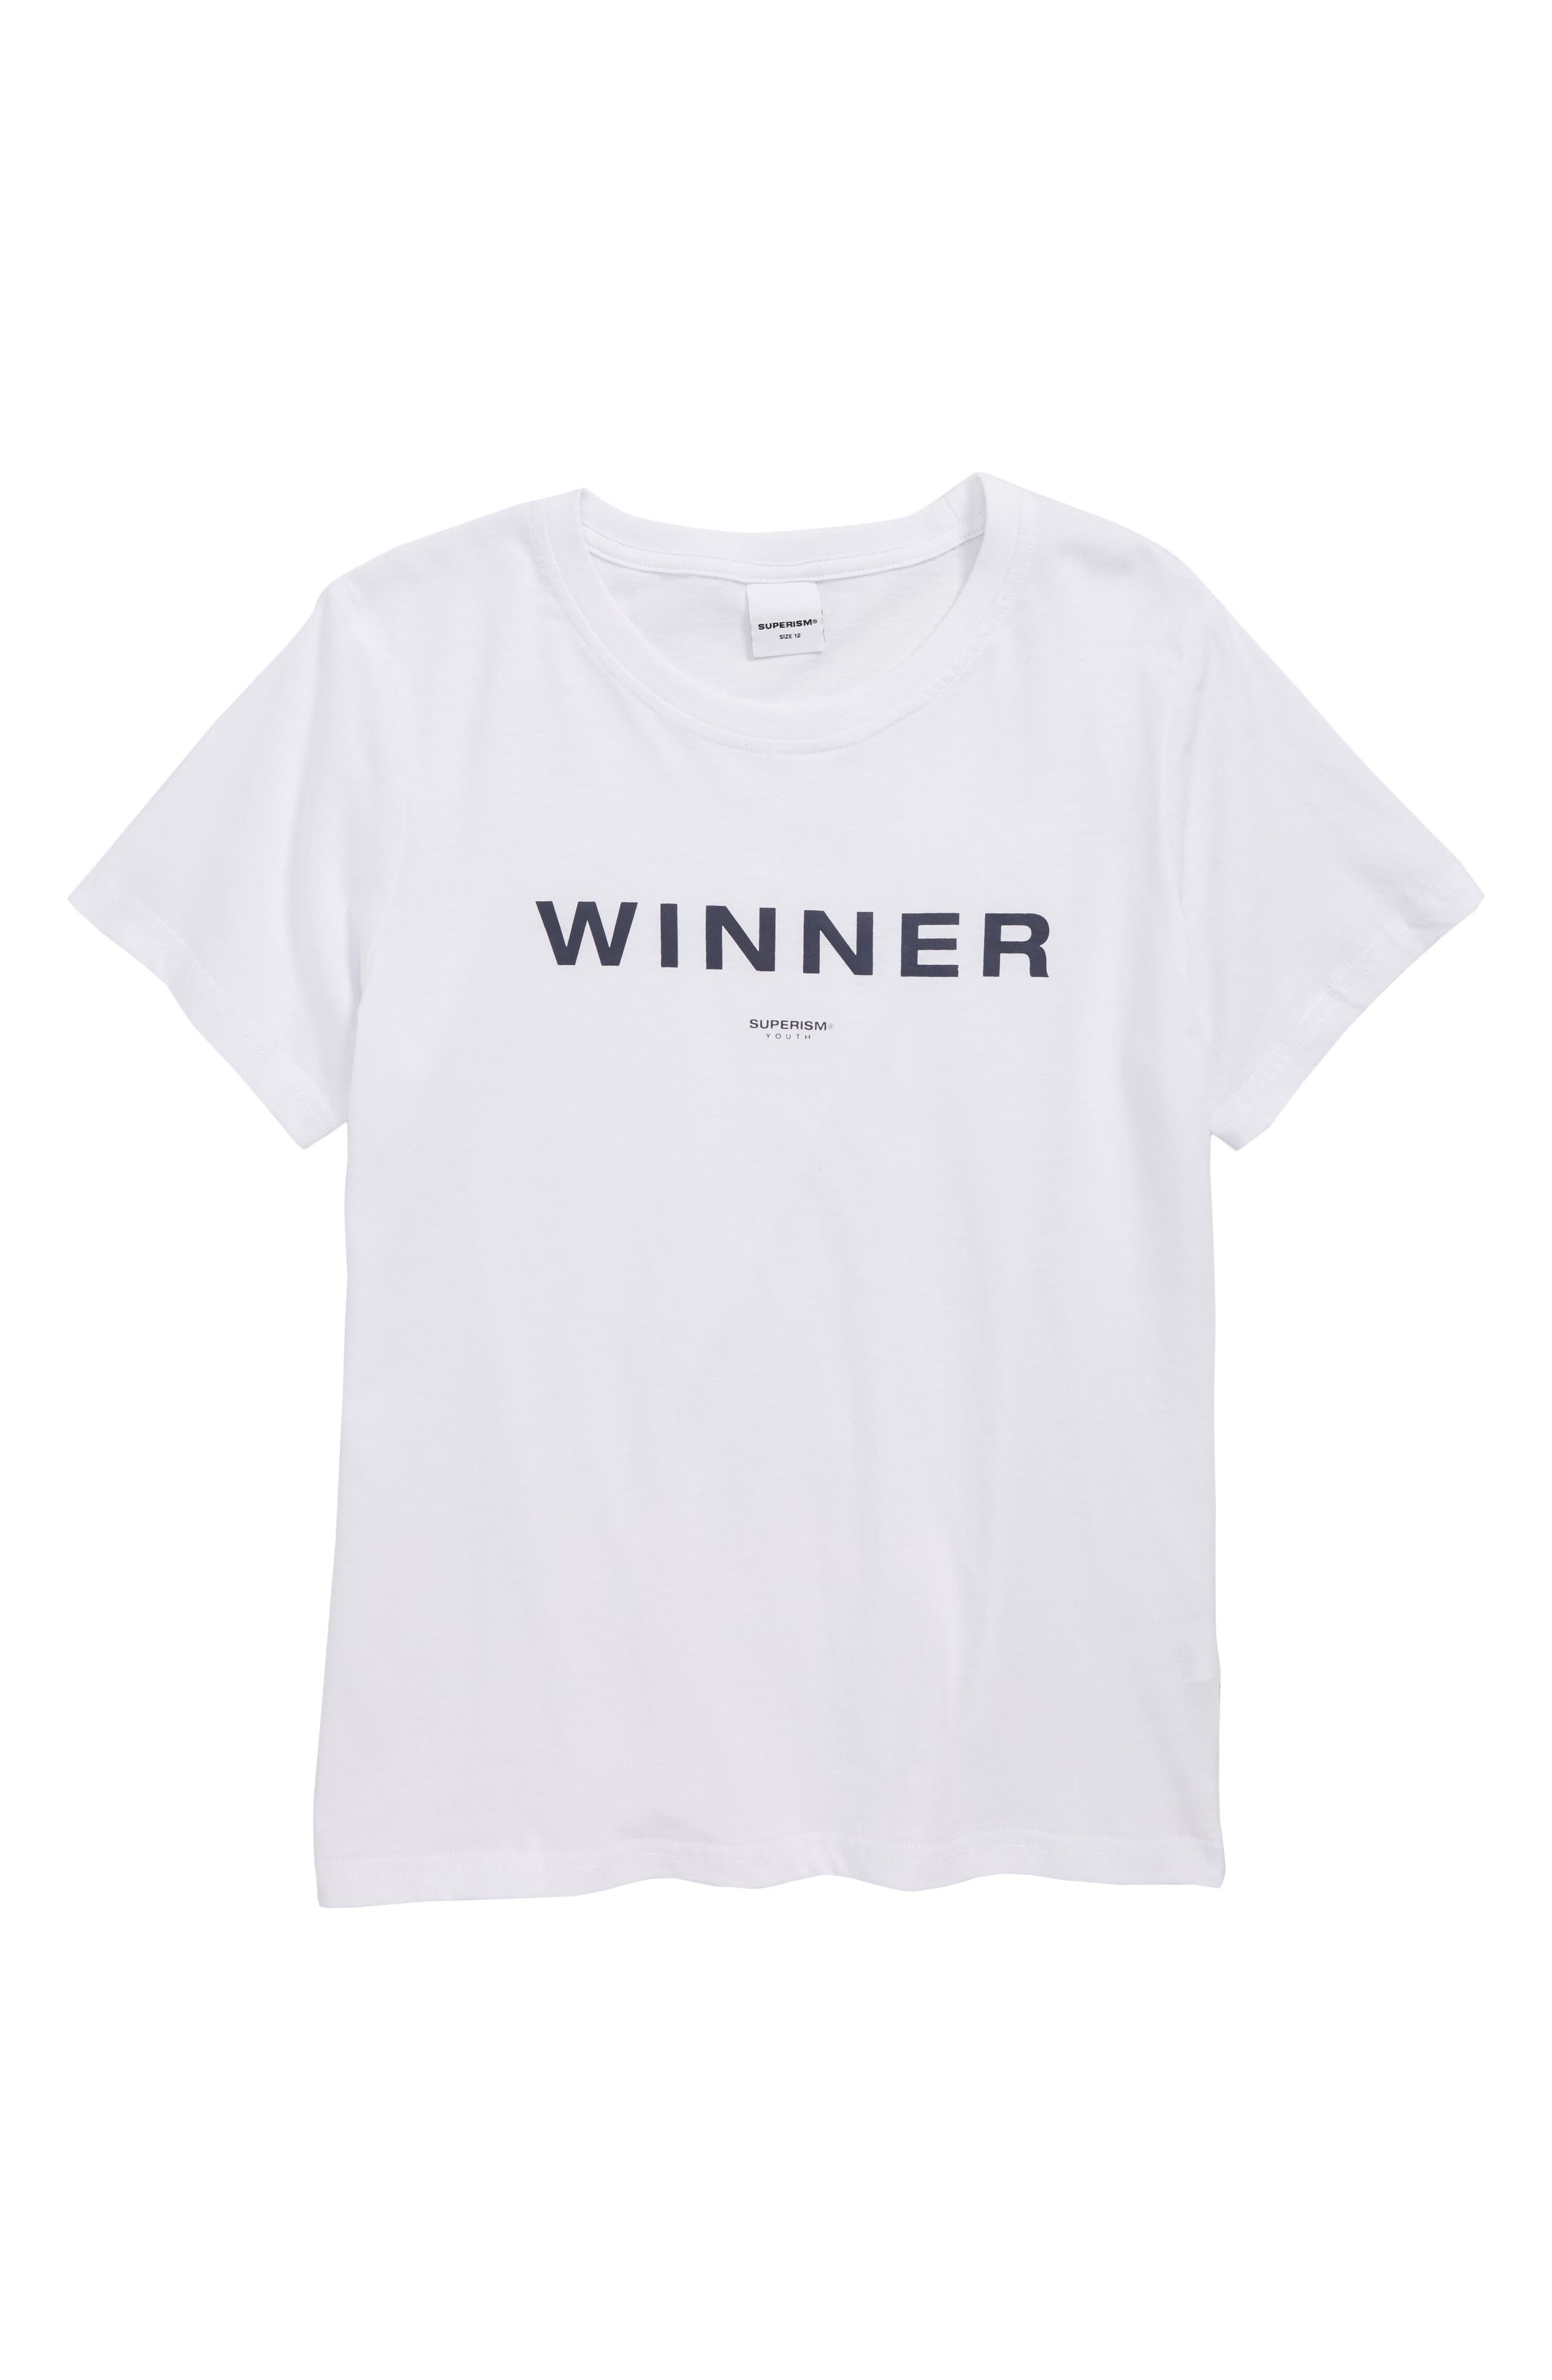 Winner Graphic T-Shirt,                             Main thumbnail 1, color,                             100